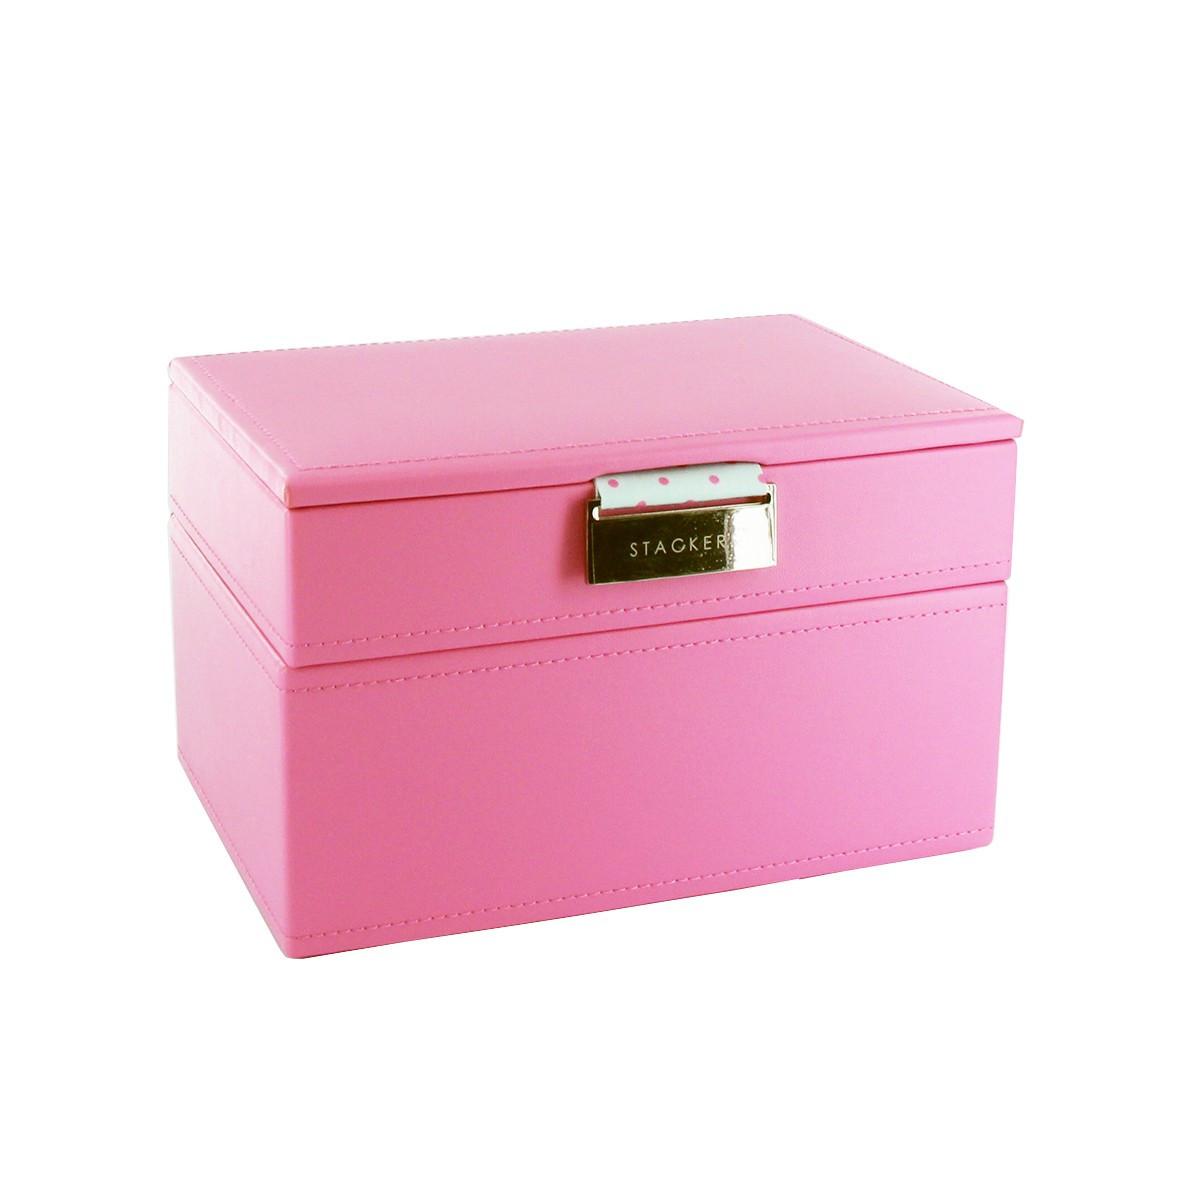 bo te bijoux rose bonbon enfant rangement. Black Bedroom Furniture Sets. Home Design Ideas